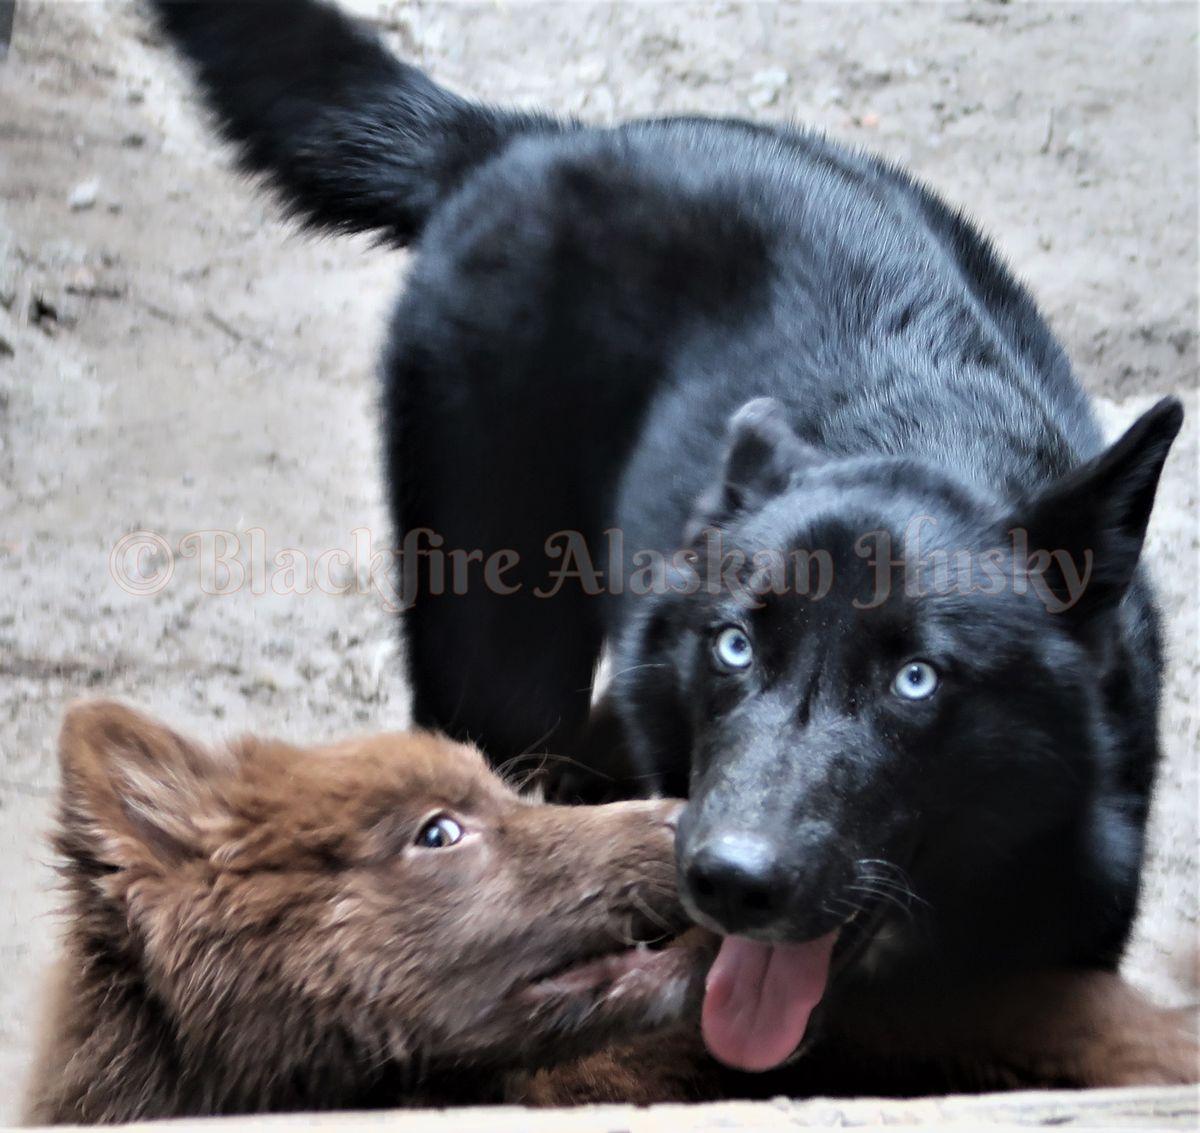 😍wolfdog Black Blue Eyed😍 (blackfire Kennel-blackfire Alaskan